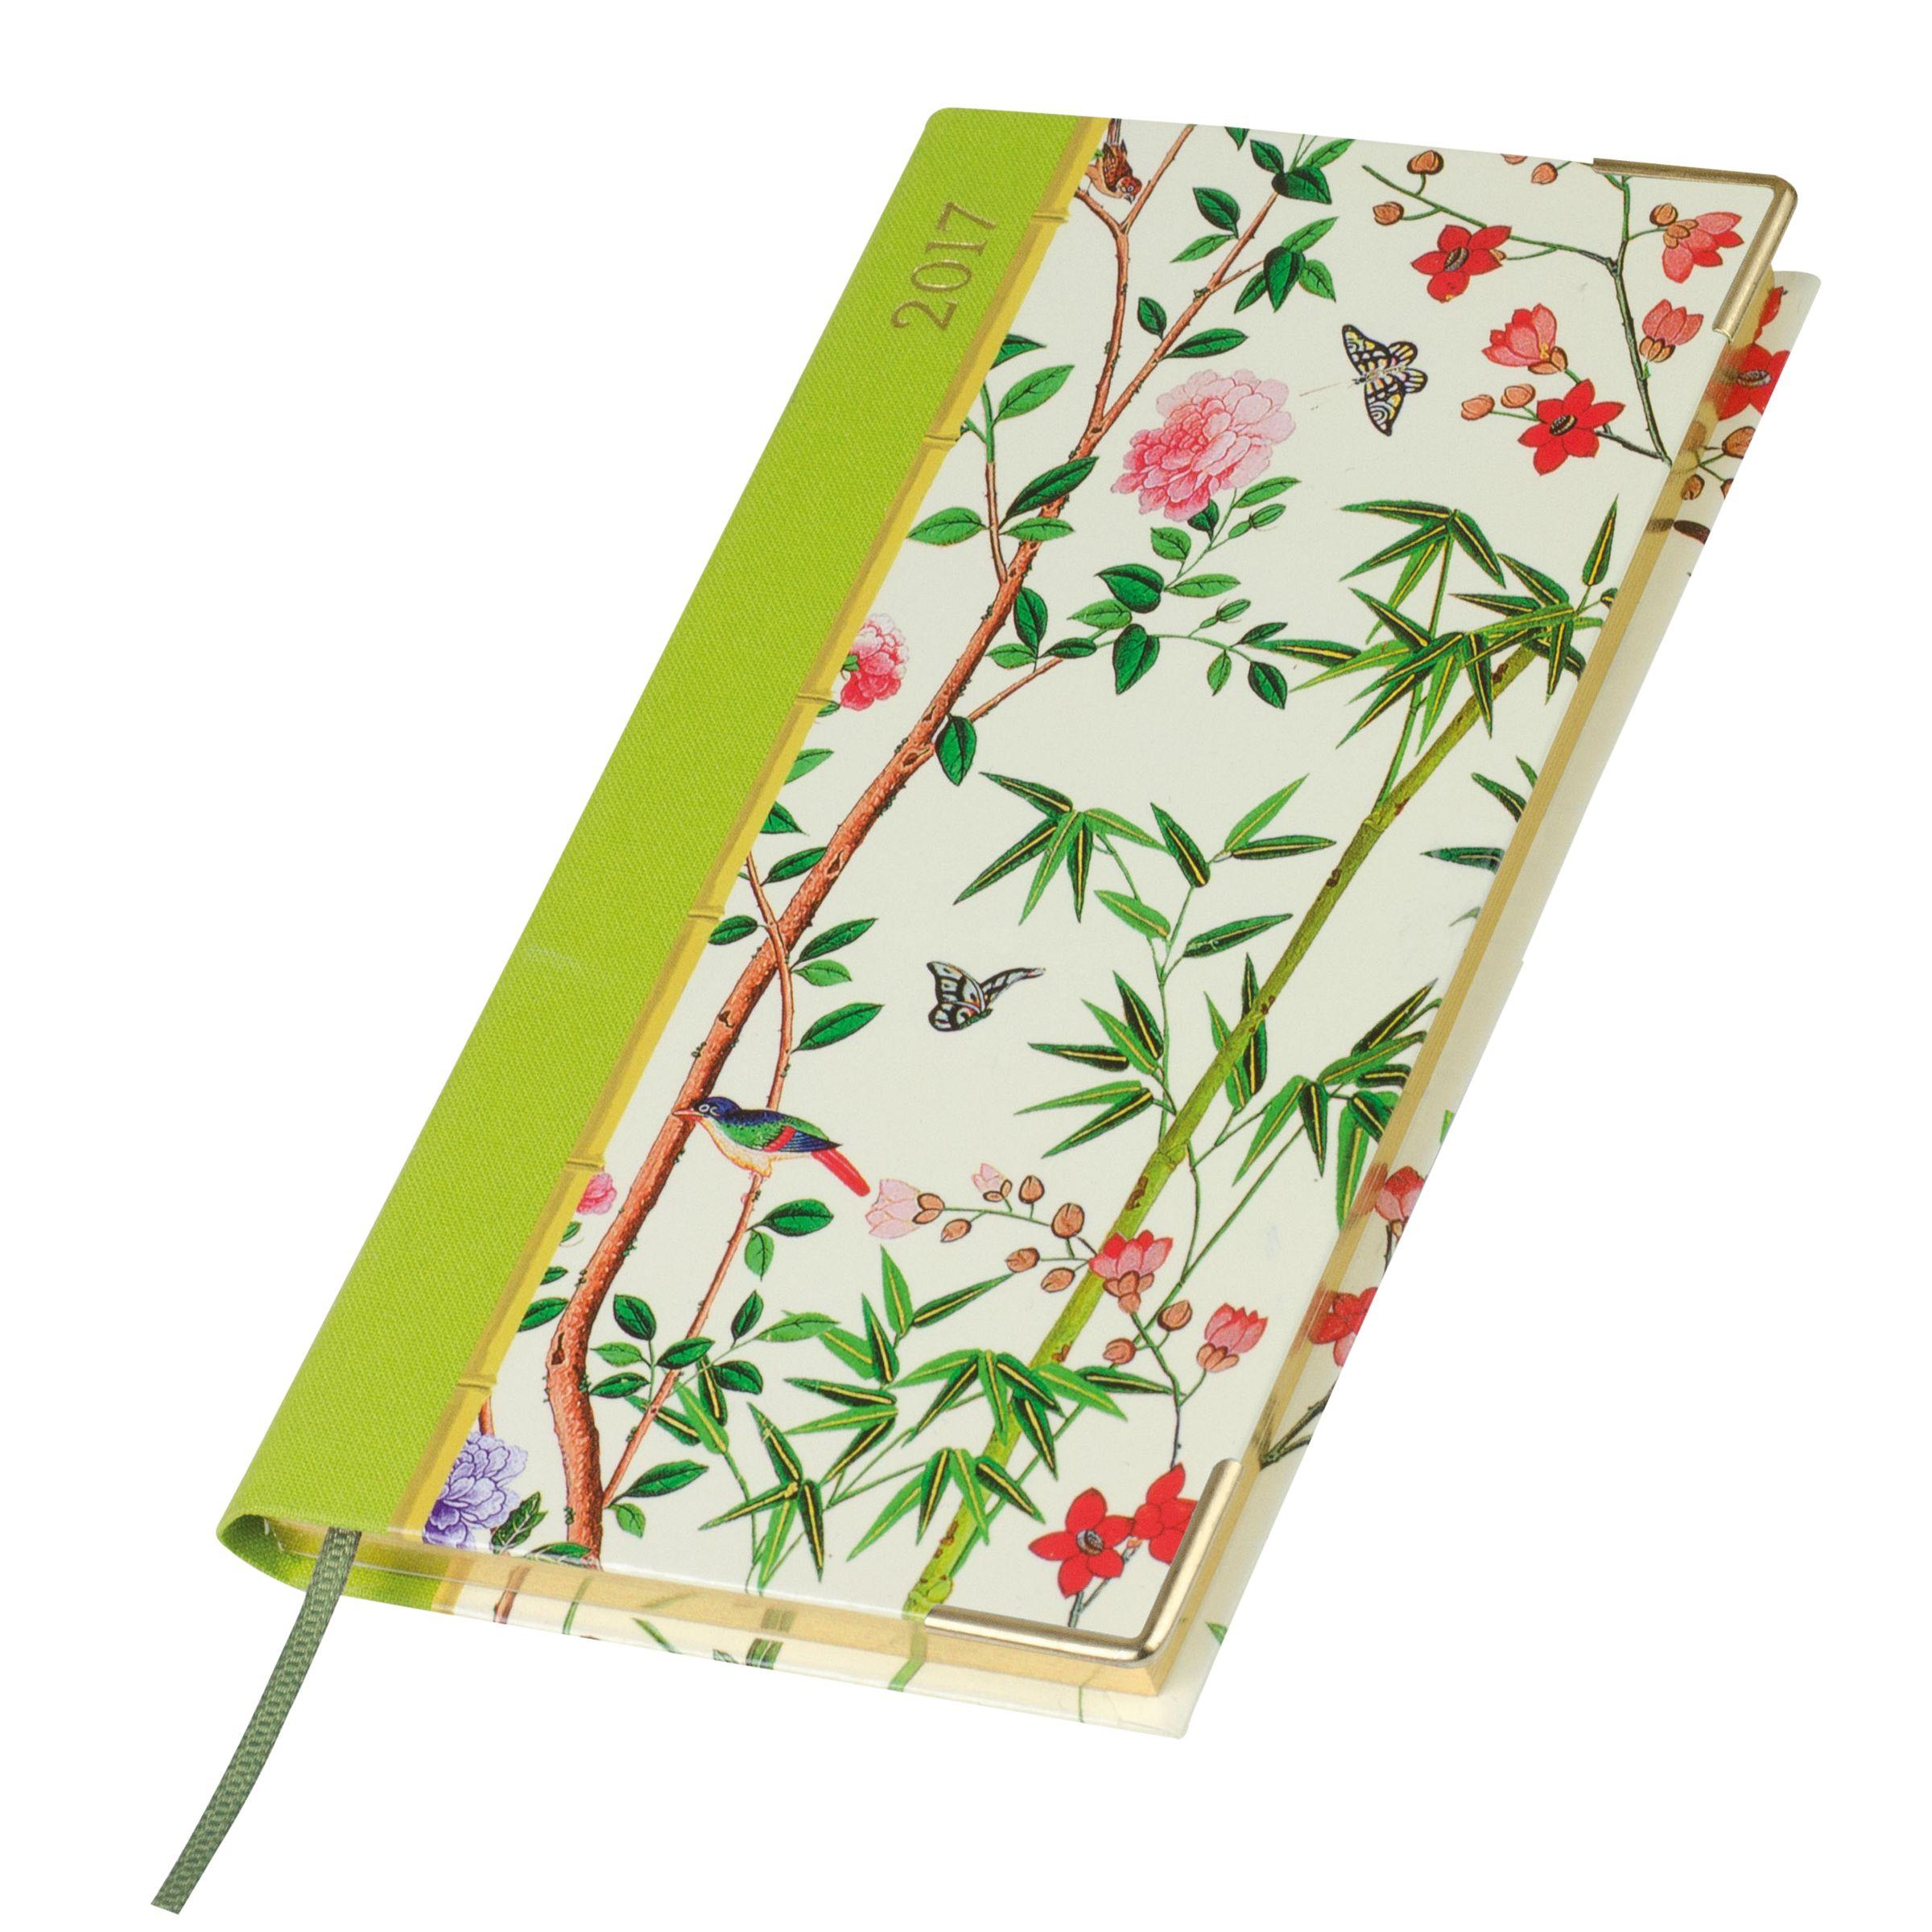 Caspari Caspari Butterflies And Birds Slim 2017 Diary